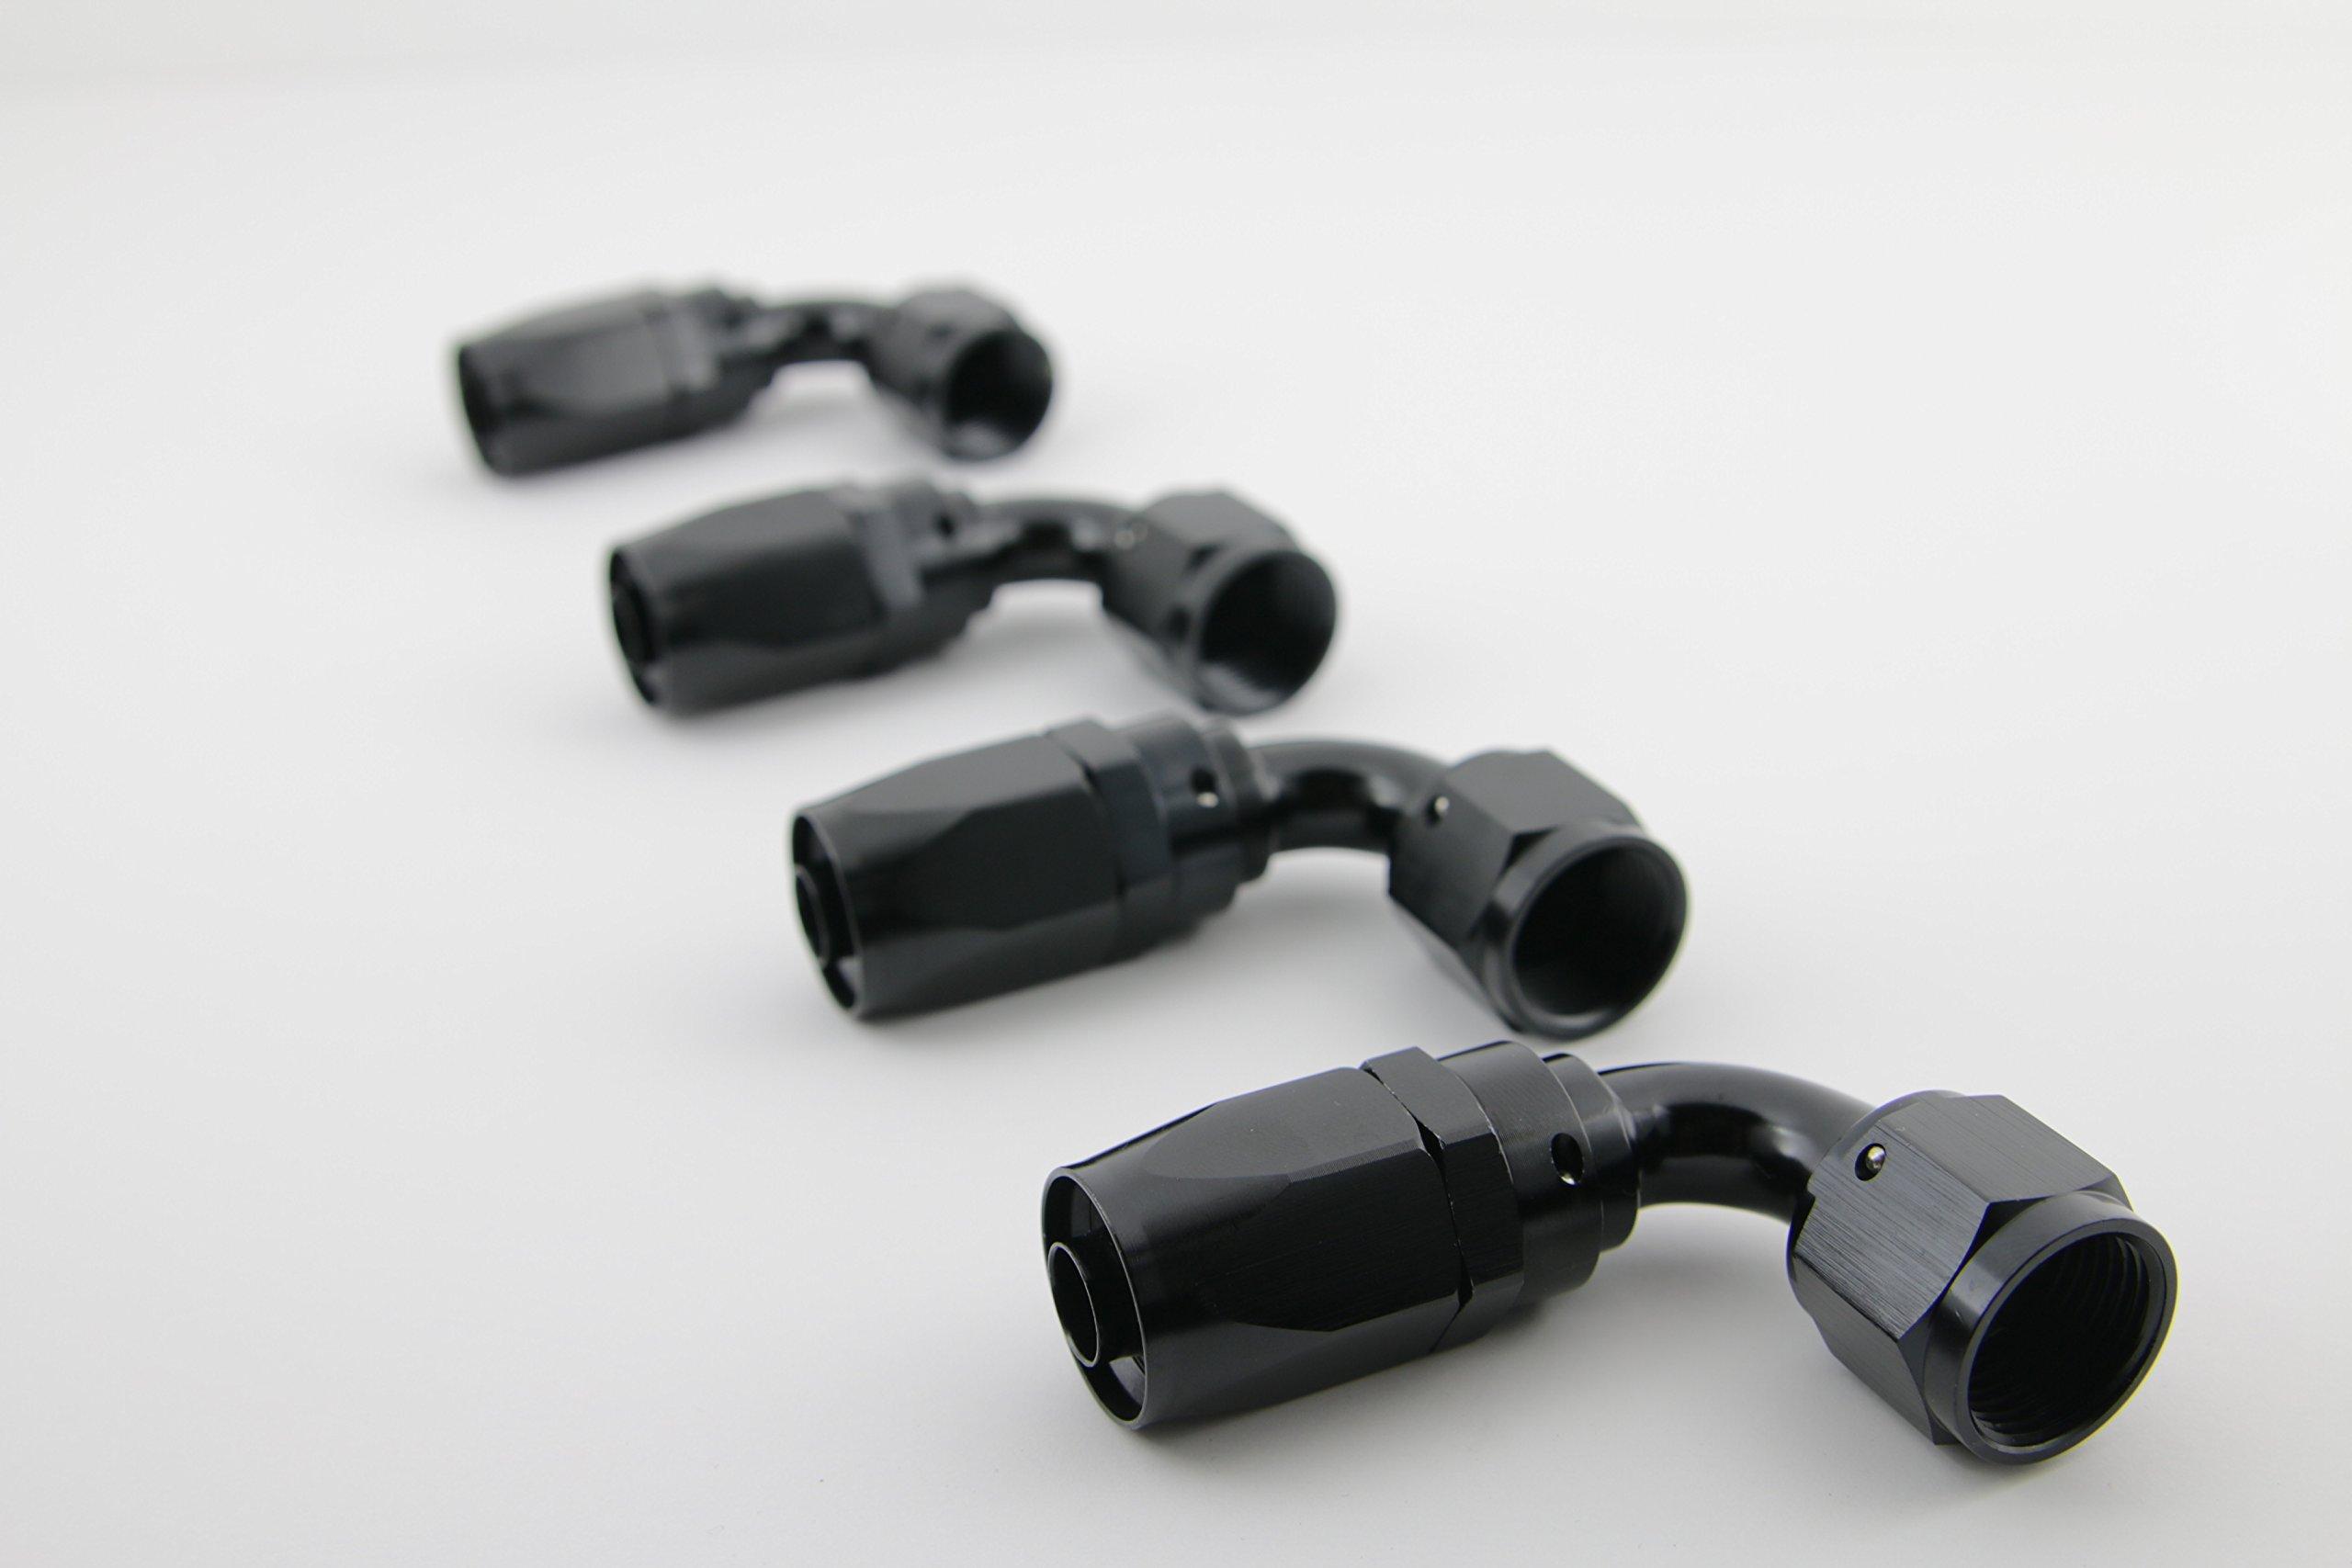 Kraken Automotive - Black 10AN 90 Degree Aluminum Swivel Hose End for Fuel, Oil, Coolant and Air (4 Pack)